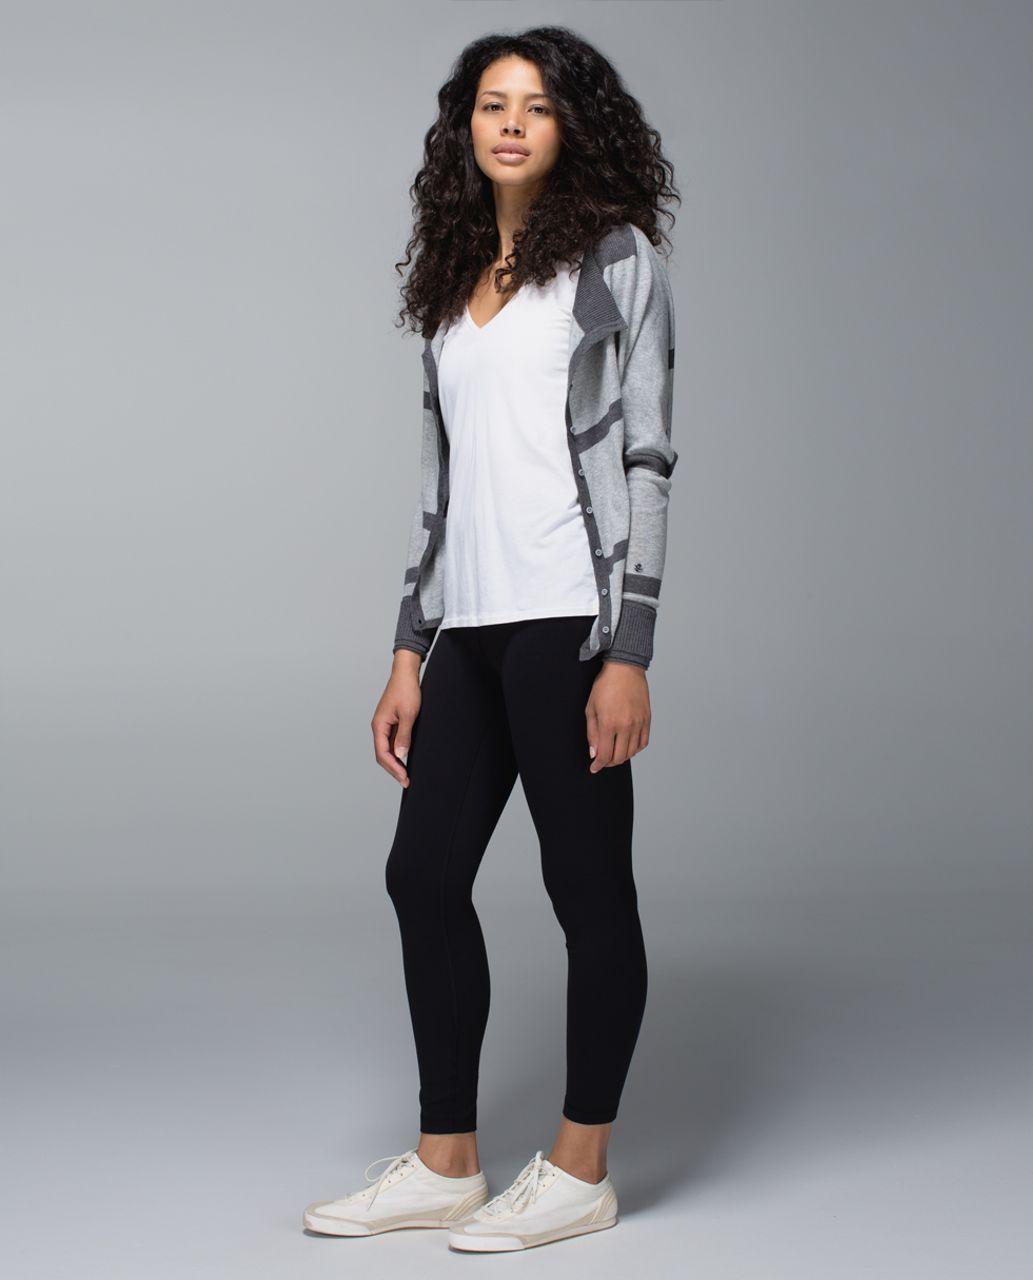 Lululemon After Class Cardigan - Heathered Medium Grey / Heathered Dark Grey / Heathered Dark Grey